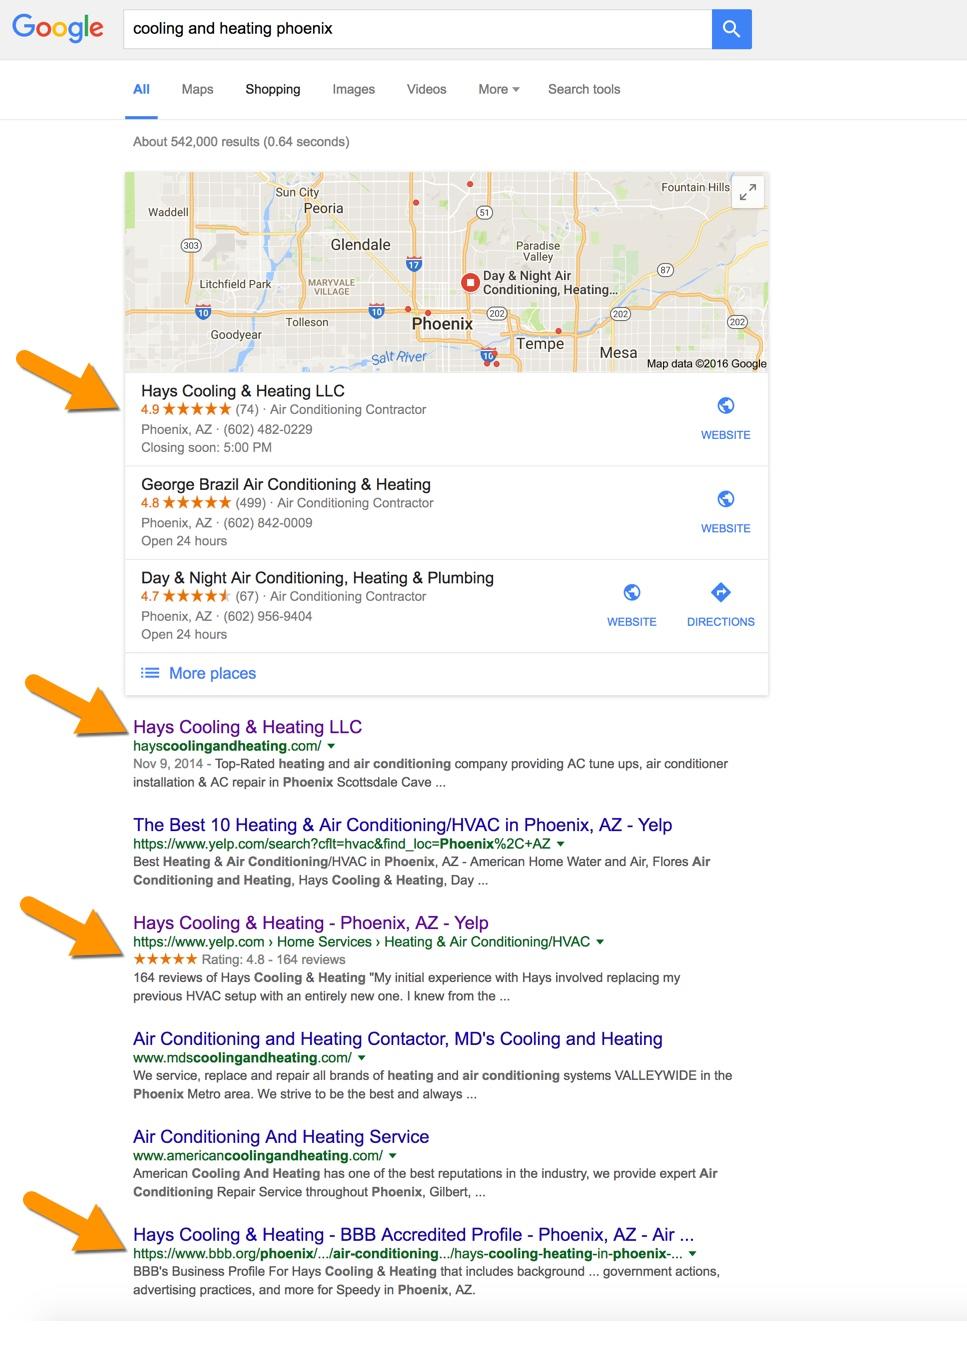 rank more than website on google